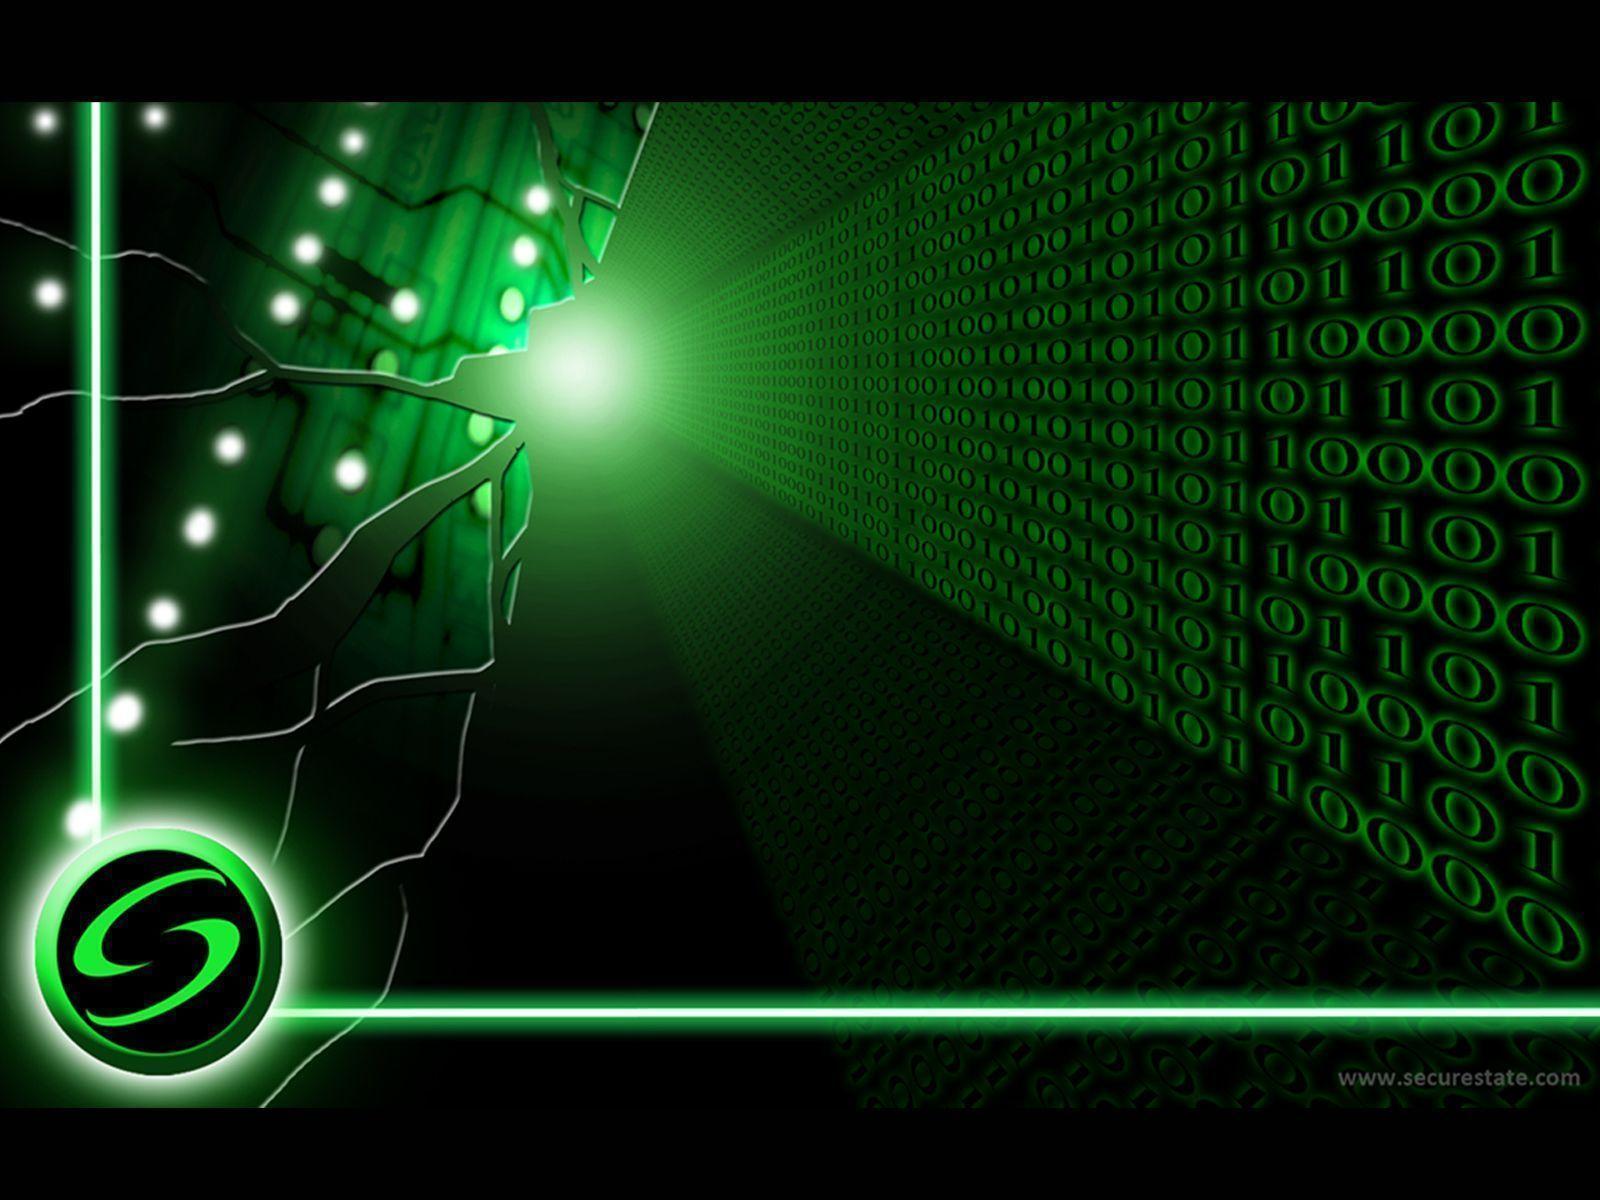 Hacker Backgrounds 1600x1200